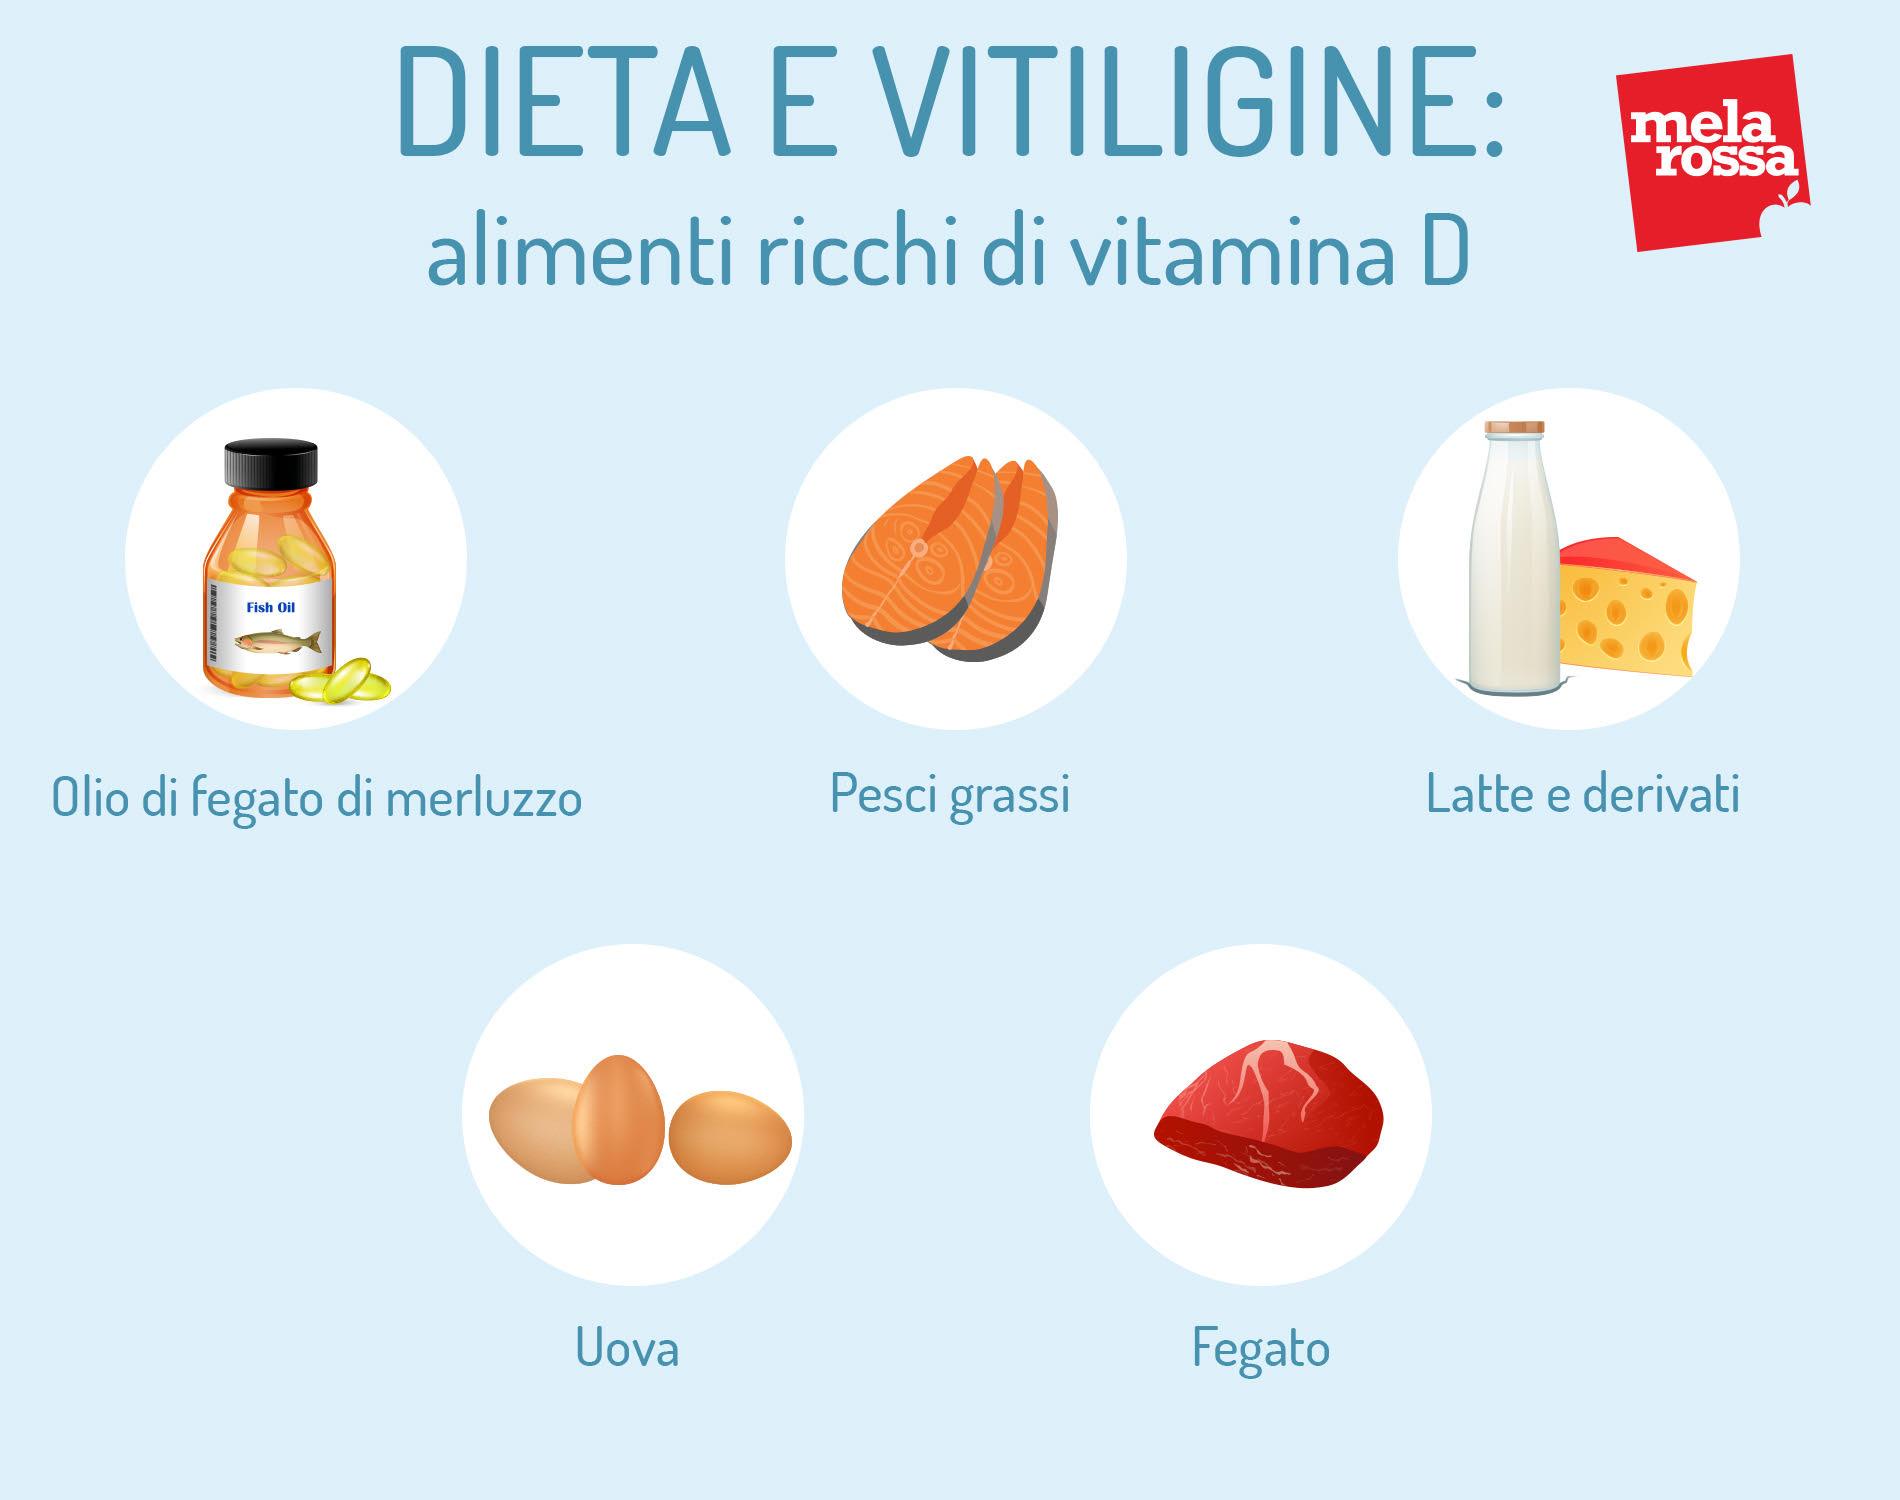 dieta e vitiligine: alimenti ricchi di vitamina D